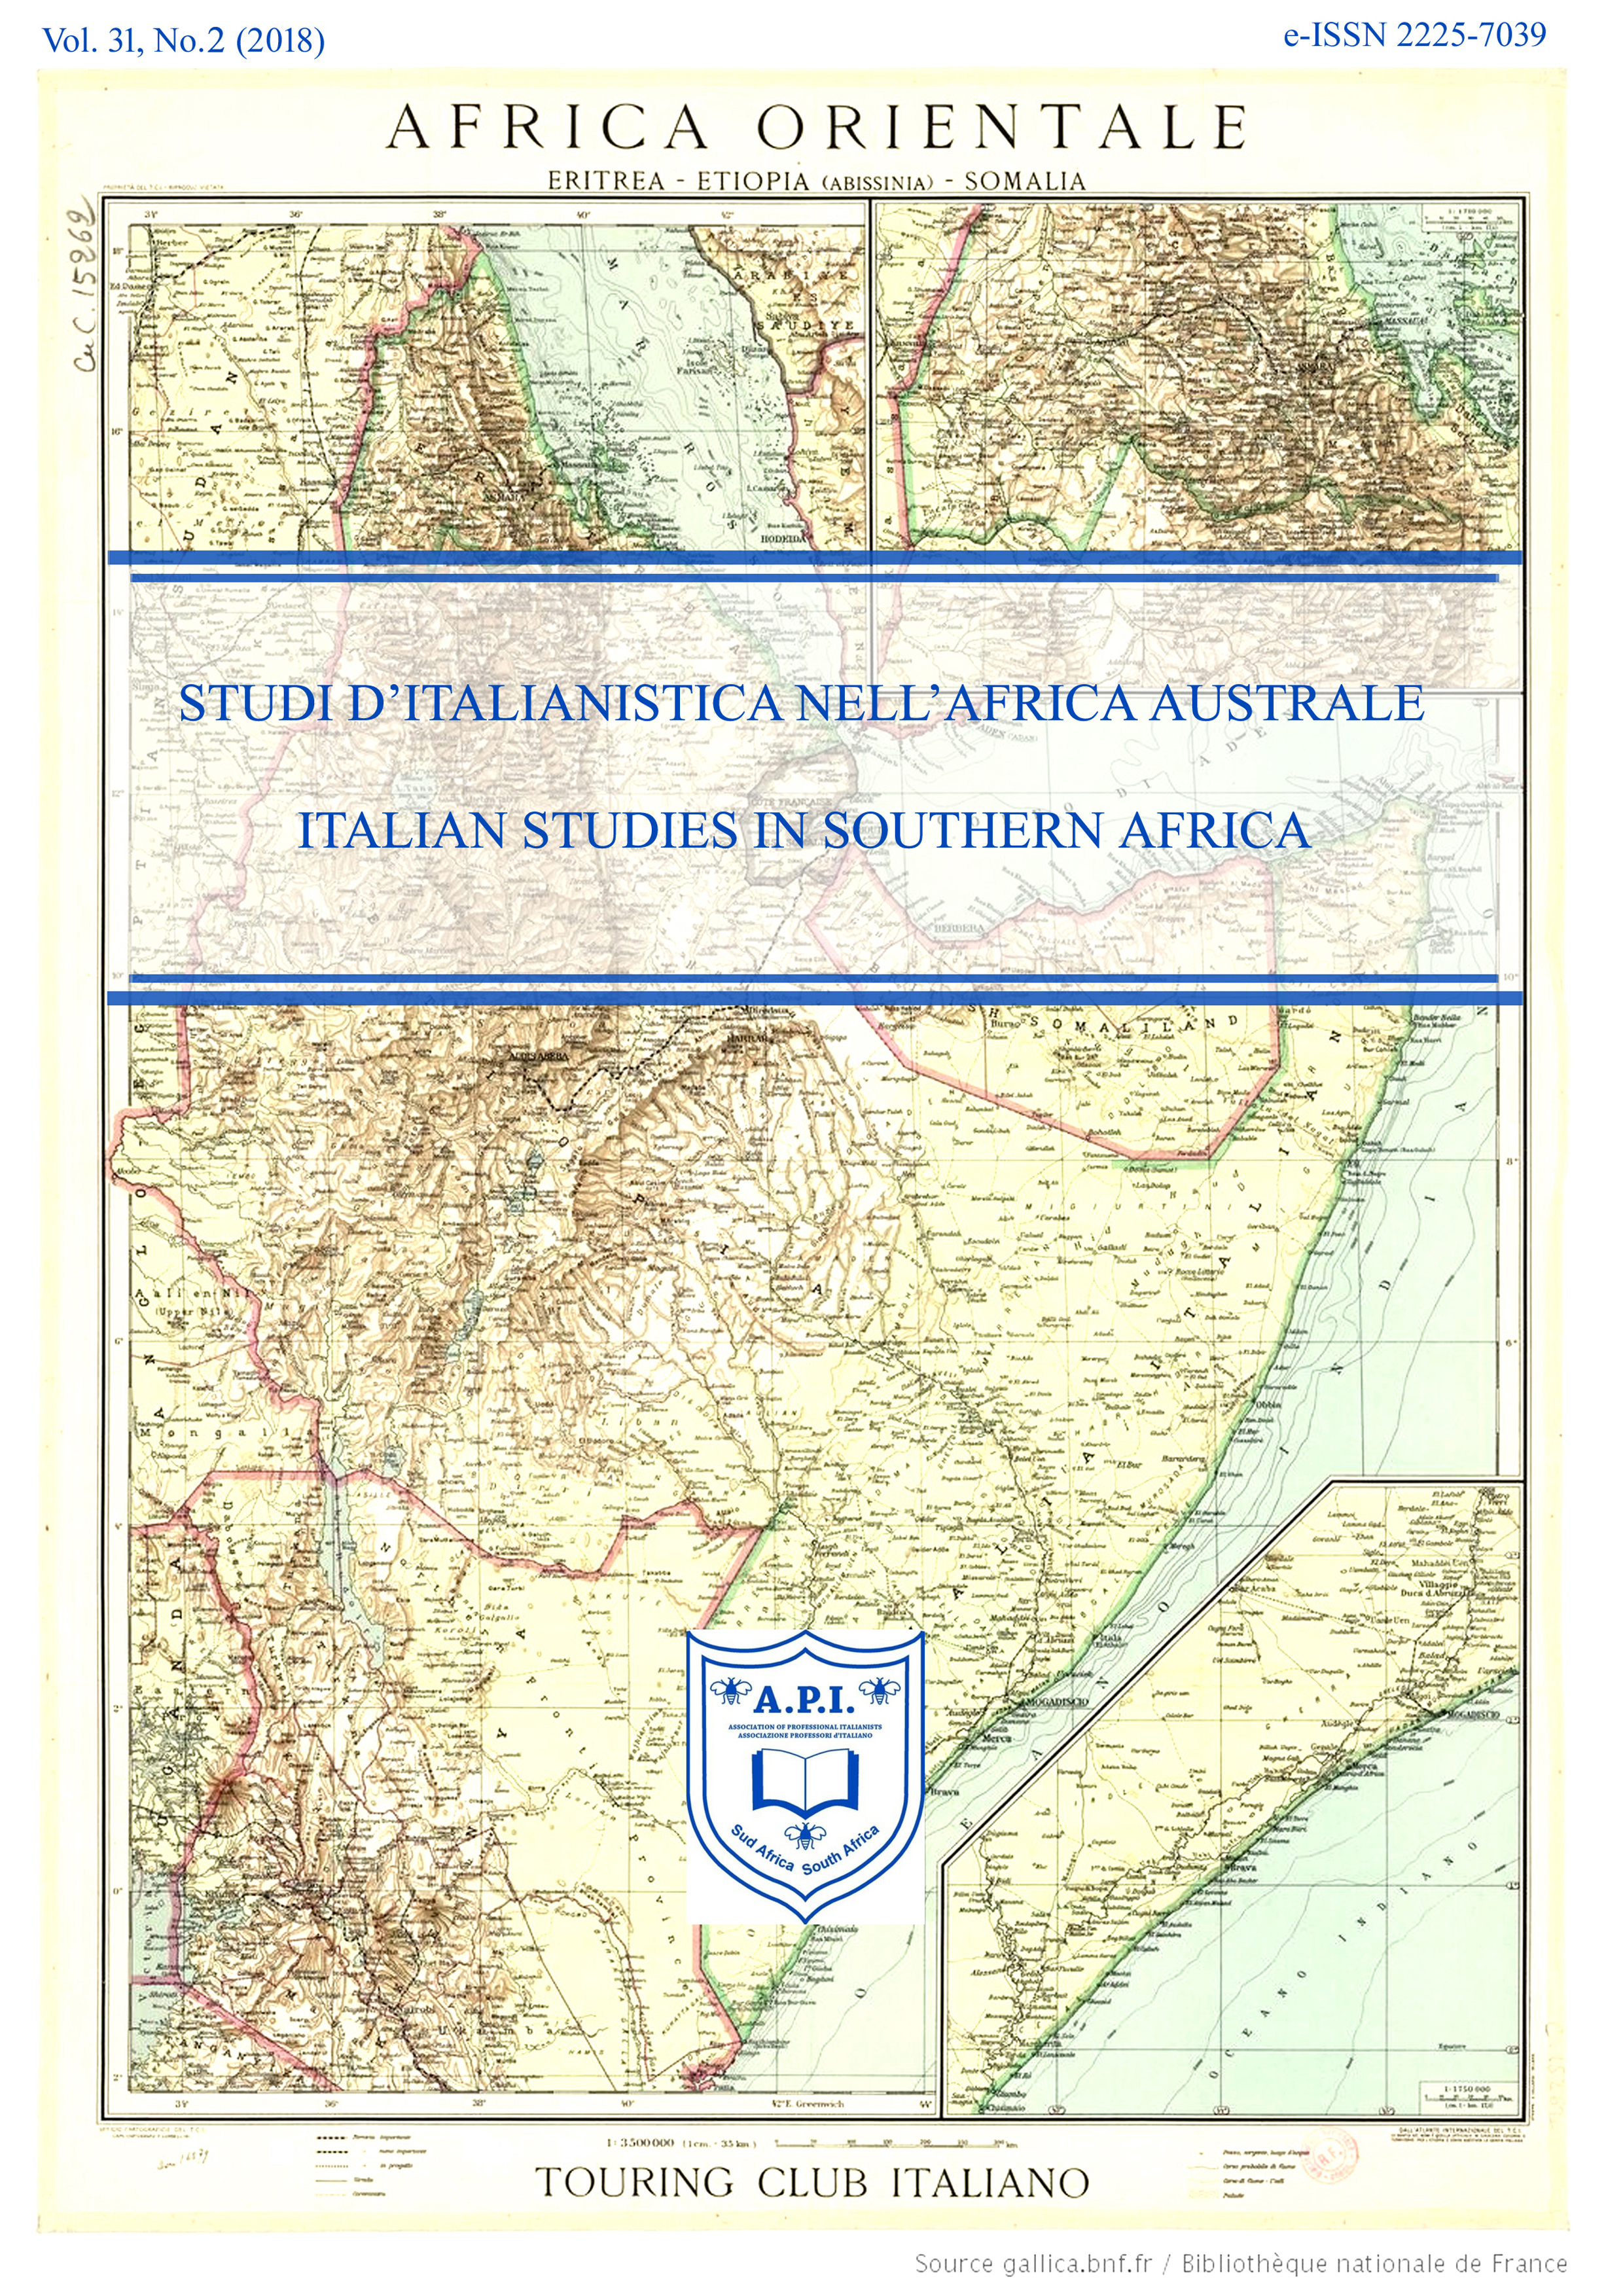 POSTCOLONIALISMI ITALIANI IERI E OGGI / ITALIAN POSTCOLONIALISMS: PAST AND PRESENT